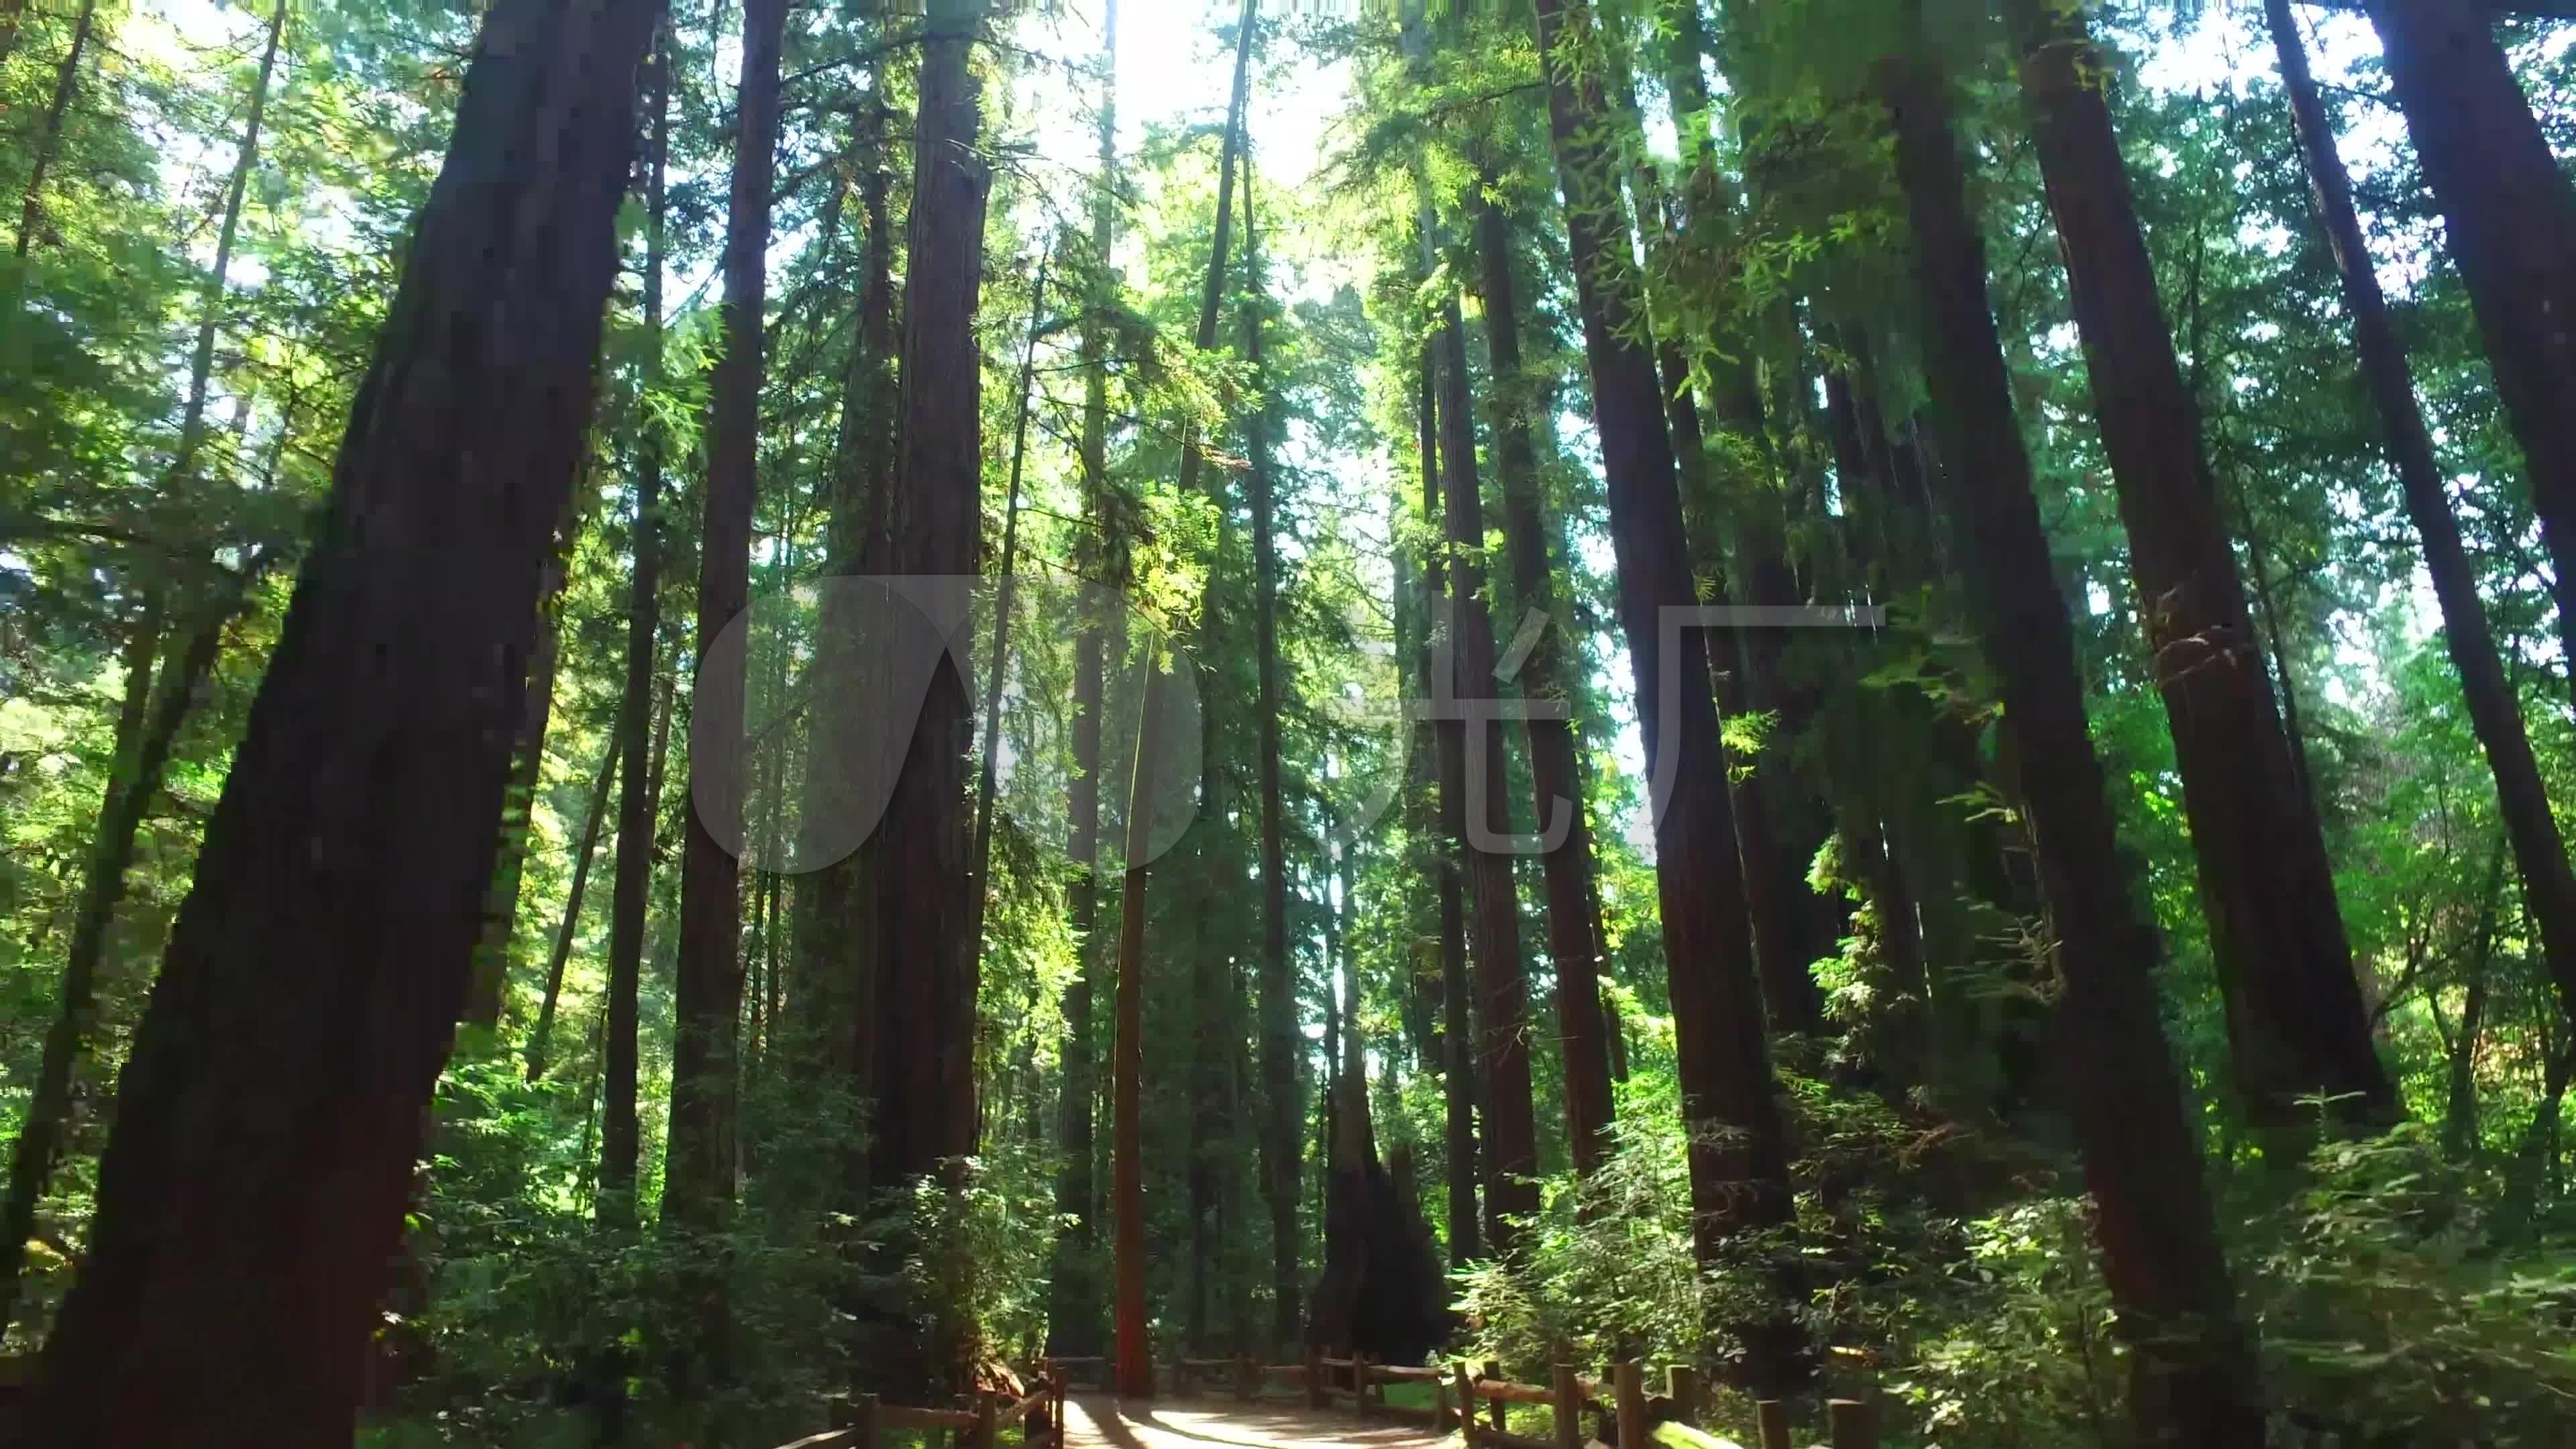 4k实拍森林素材_3840x2160_高清视频素材下载(编号:)图片